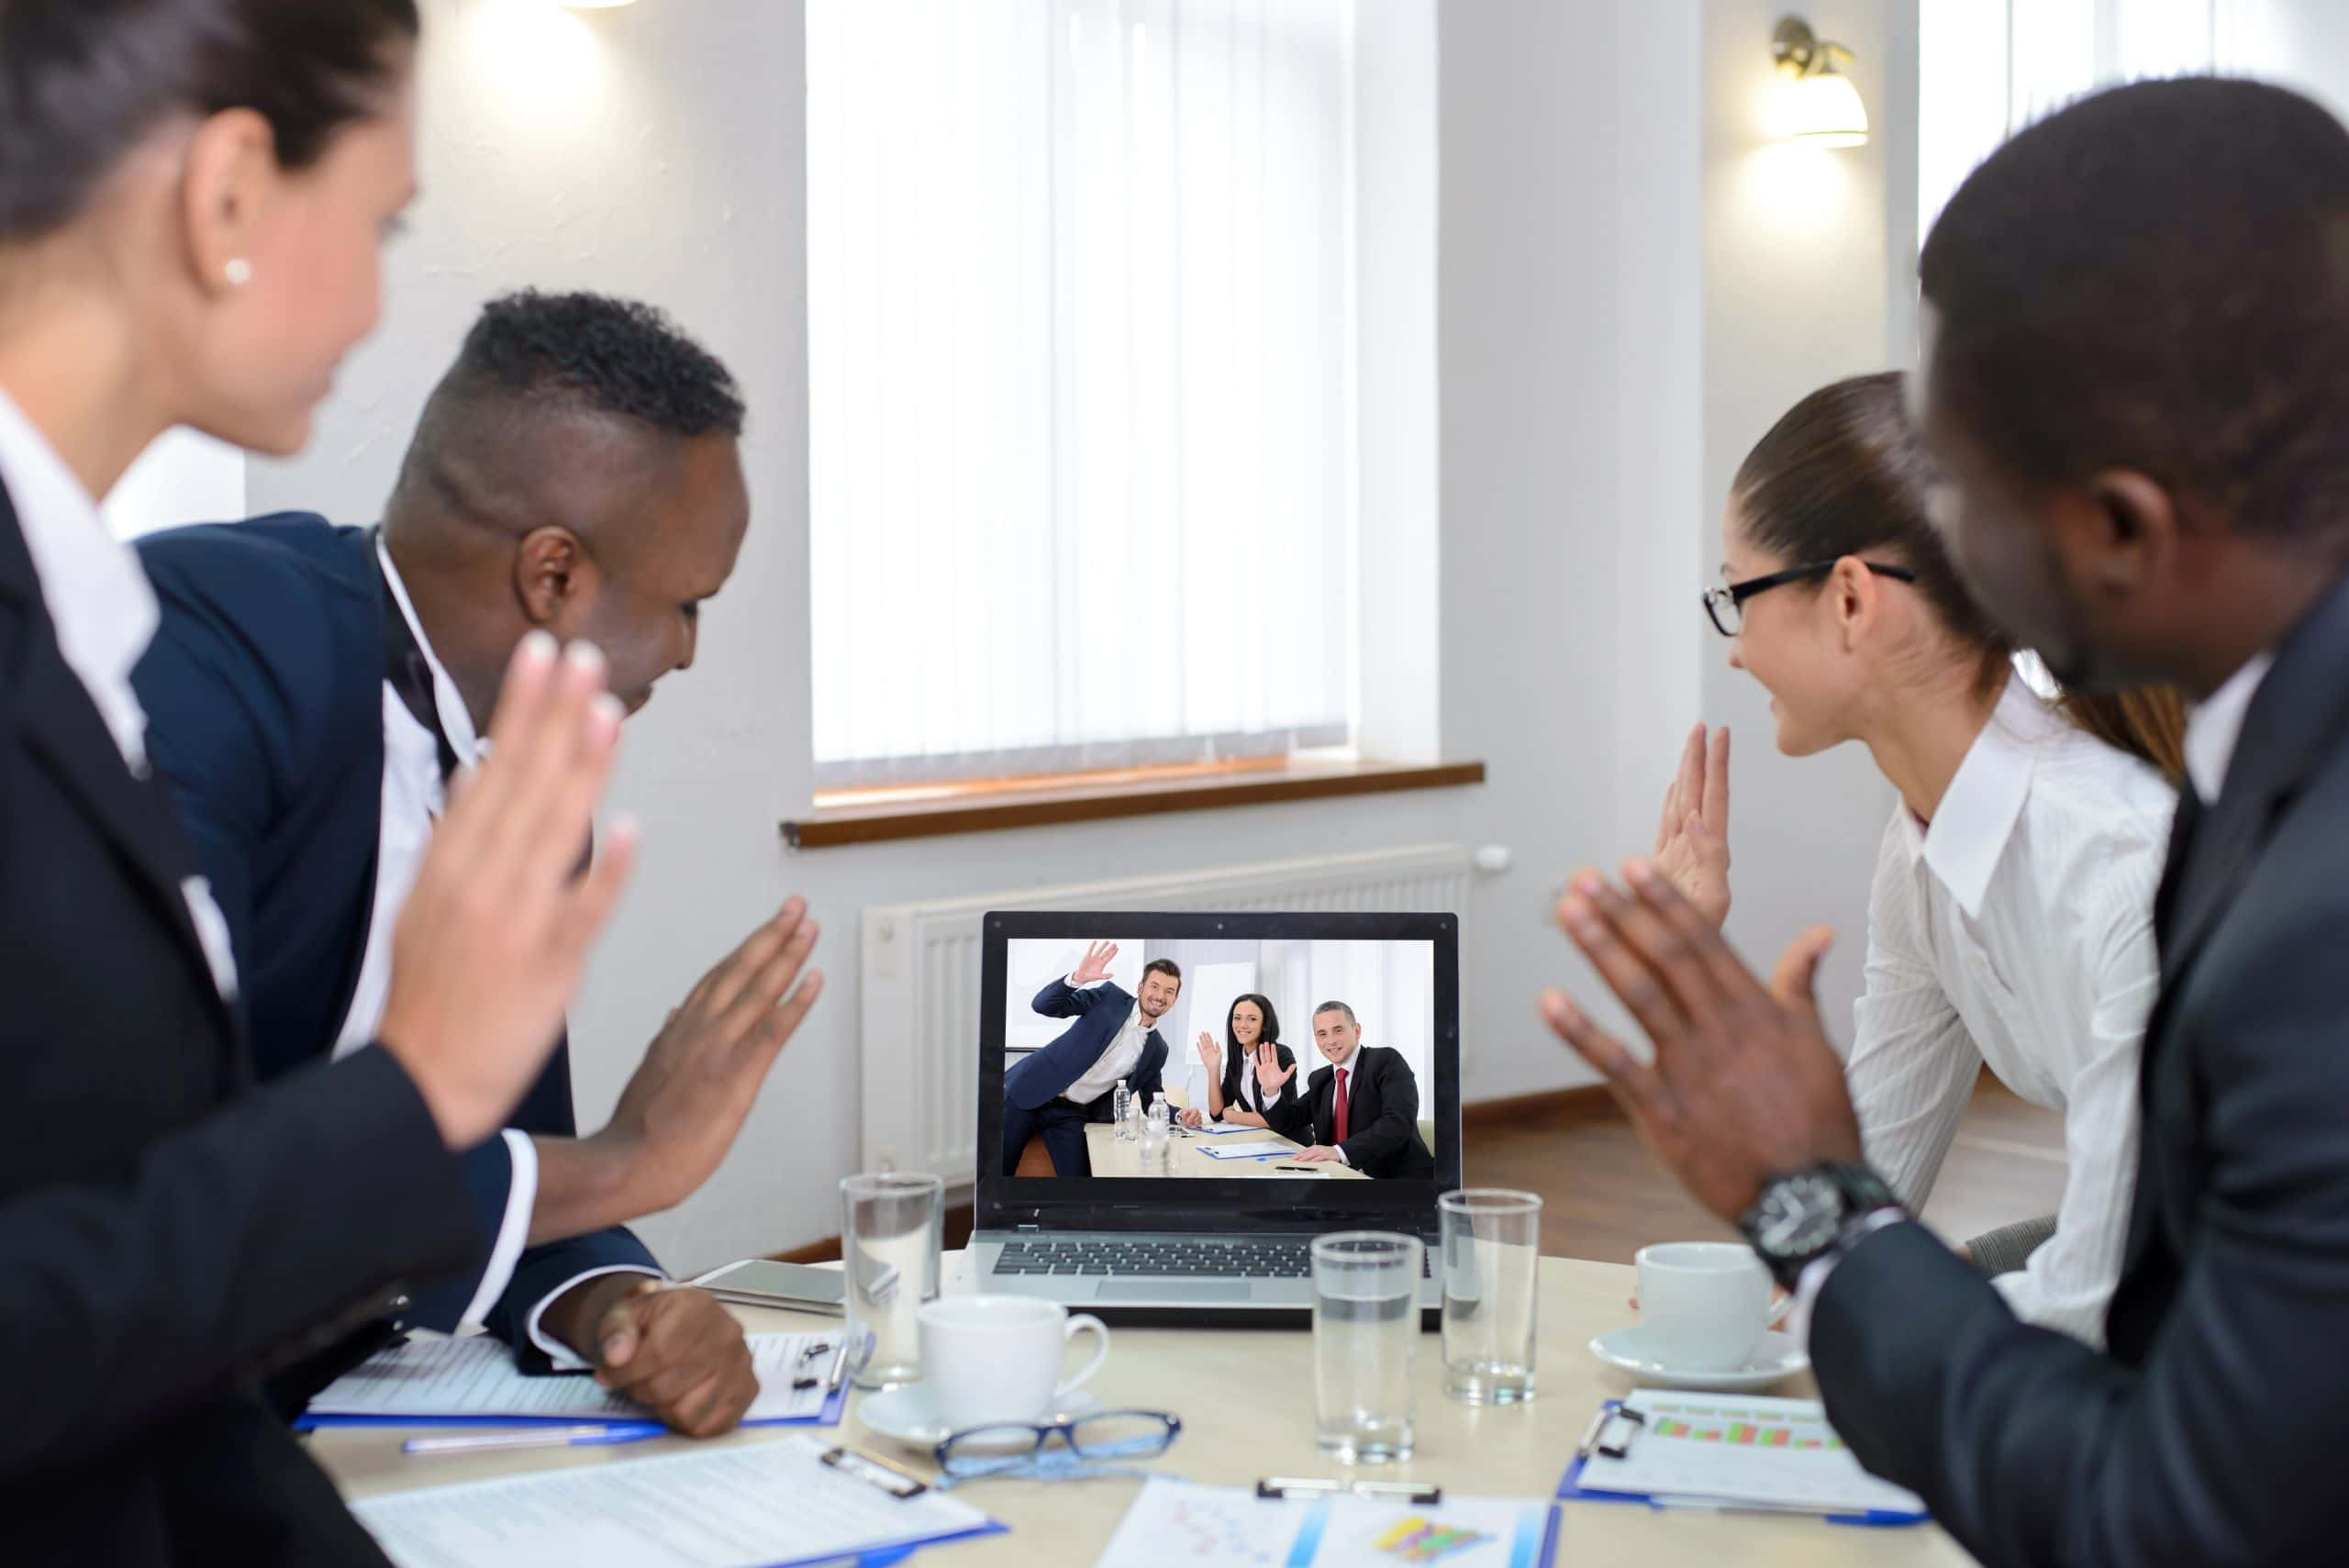 Teammeeting als Videokonferenz